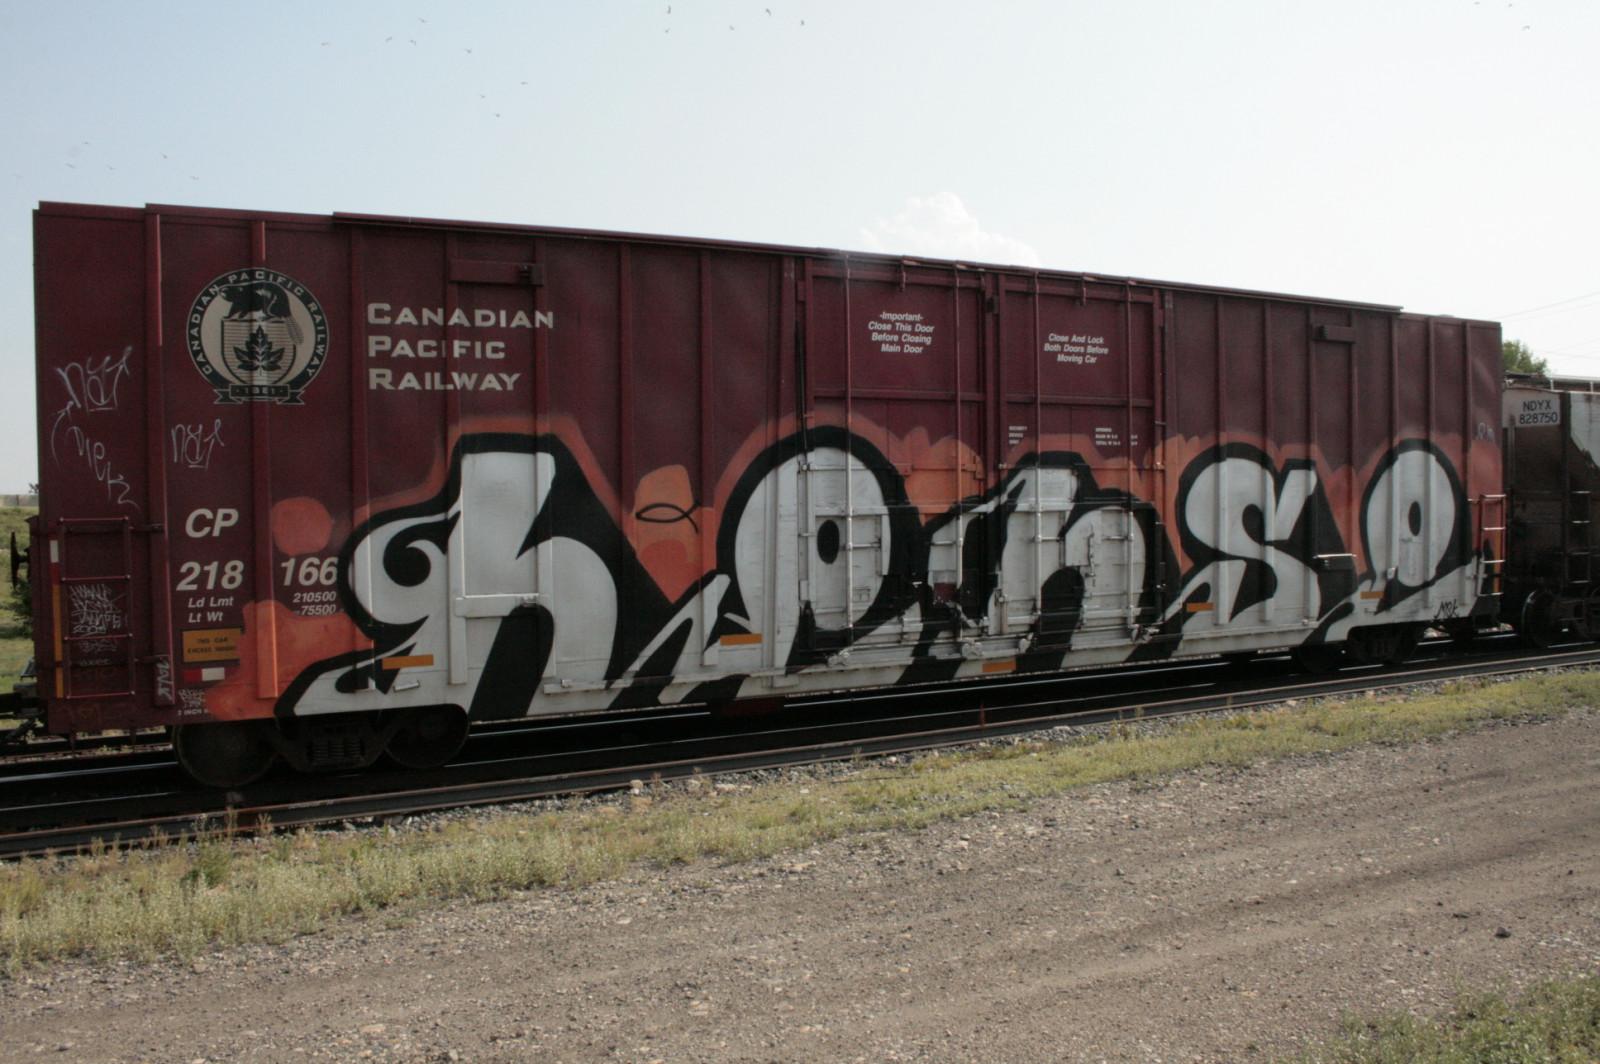 Masaustu Araba Arac Yol Fotograf Tren Celik Metal Kanada